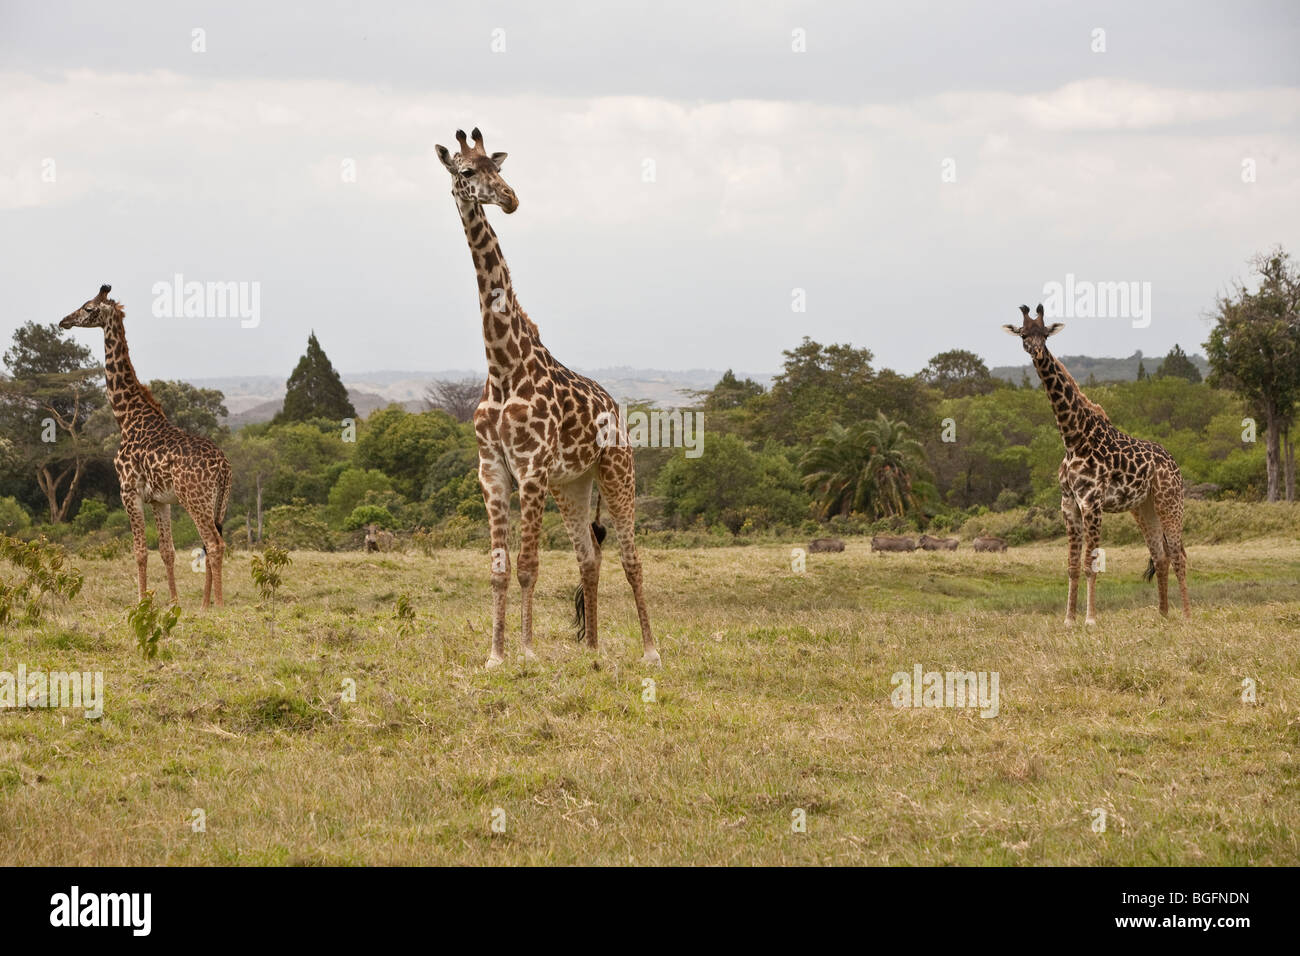 Three giraffe, Arusha National Park, Tanzania, East Africa - Stock Image